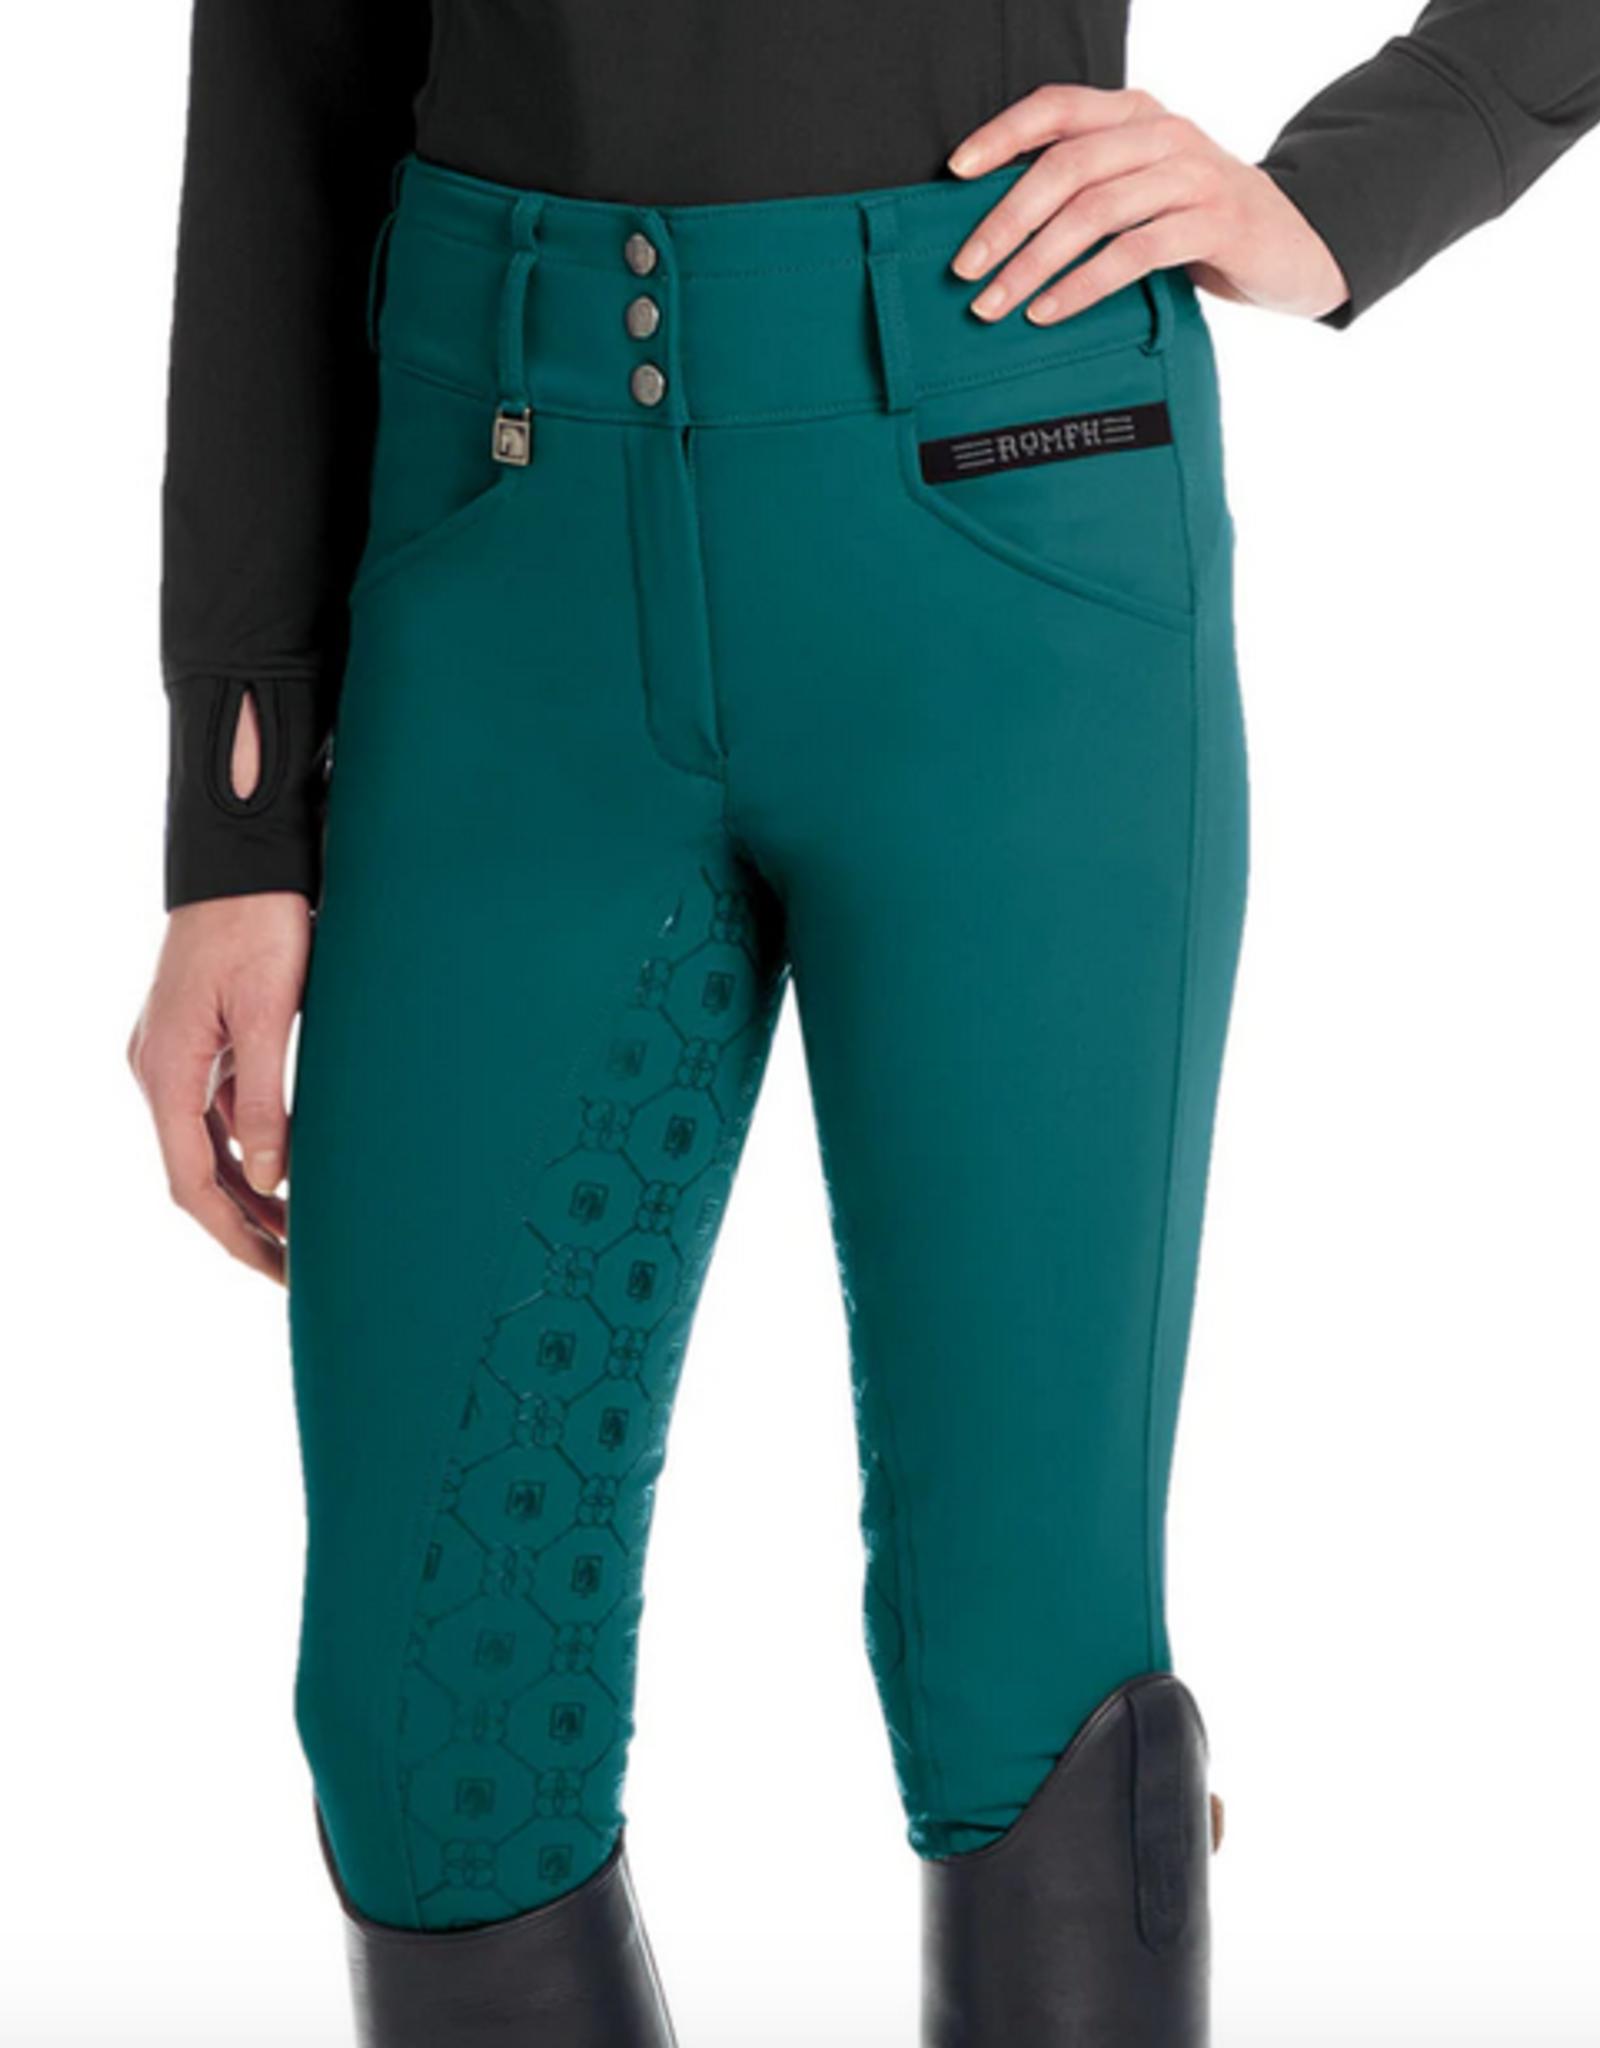 Romfh Ladies' Isabella Full Grip Breeches